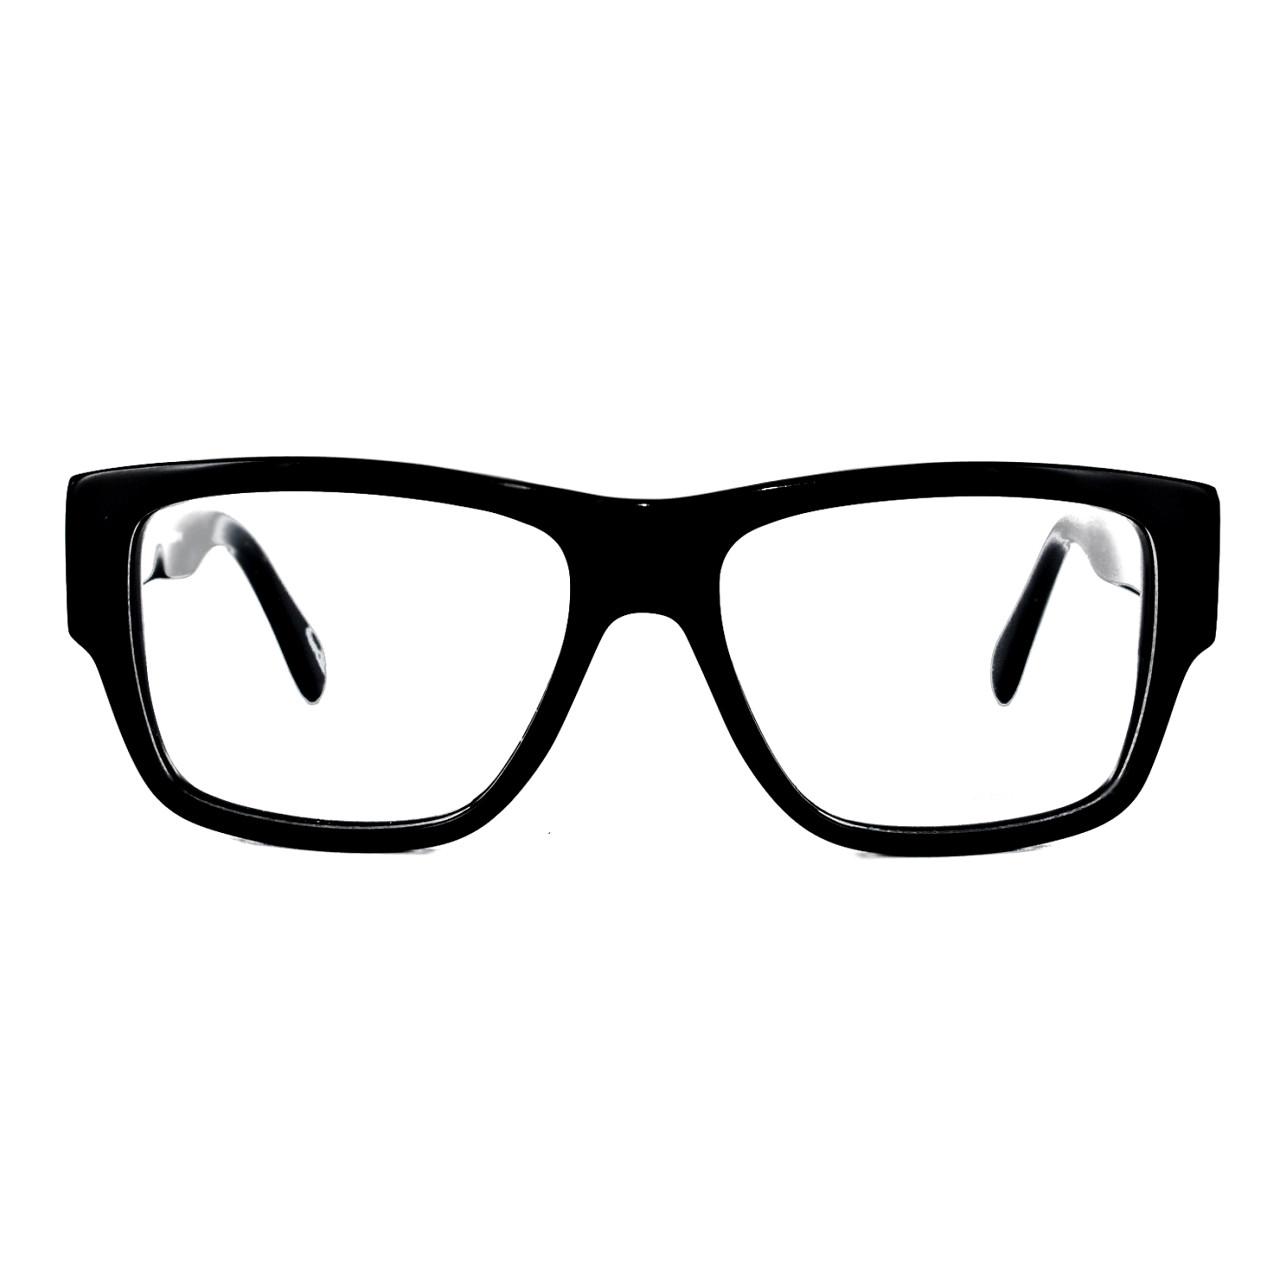 Geek Eyewear style 2011 Black